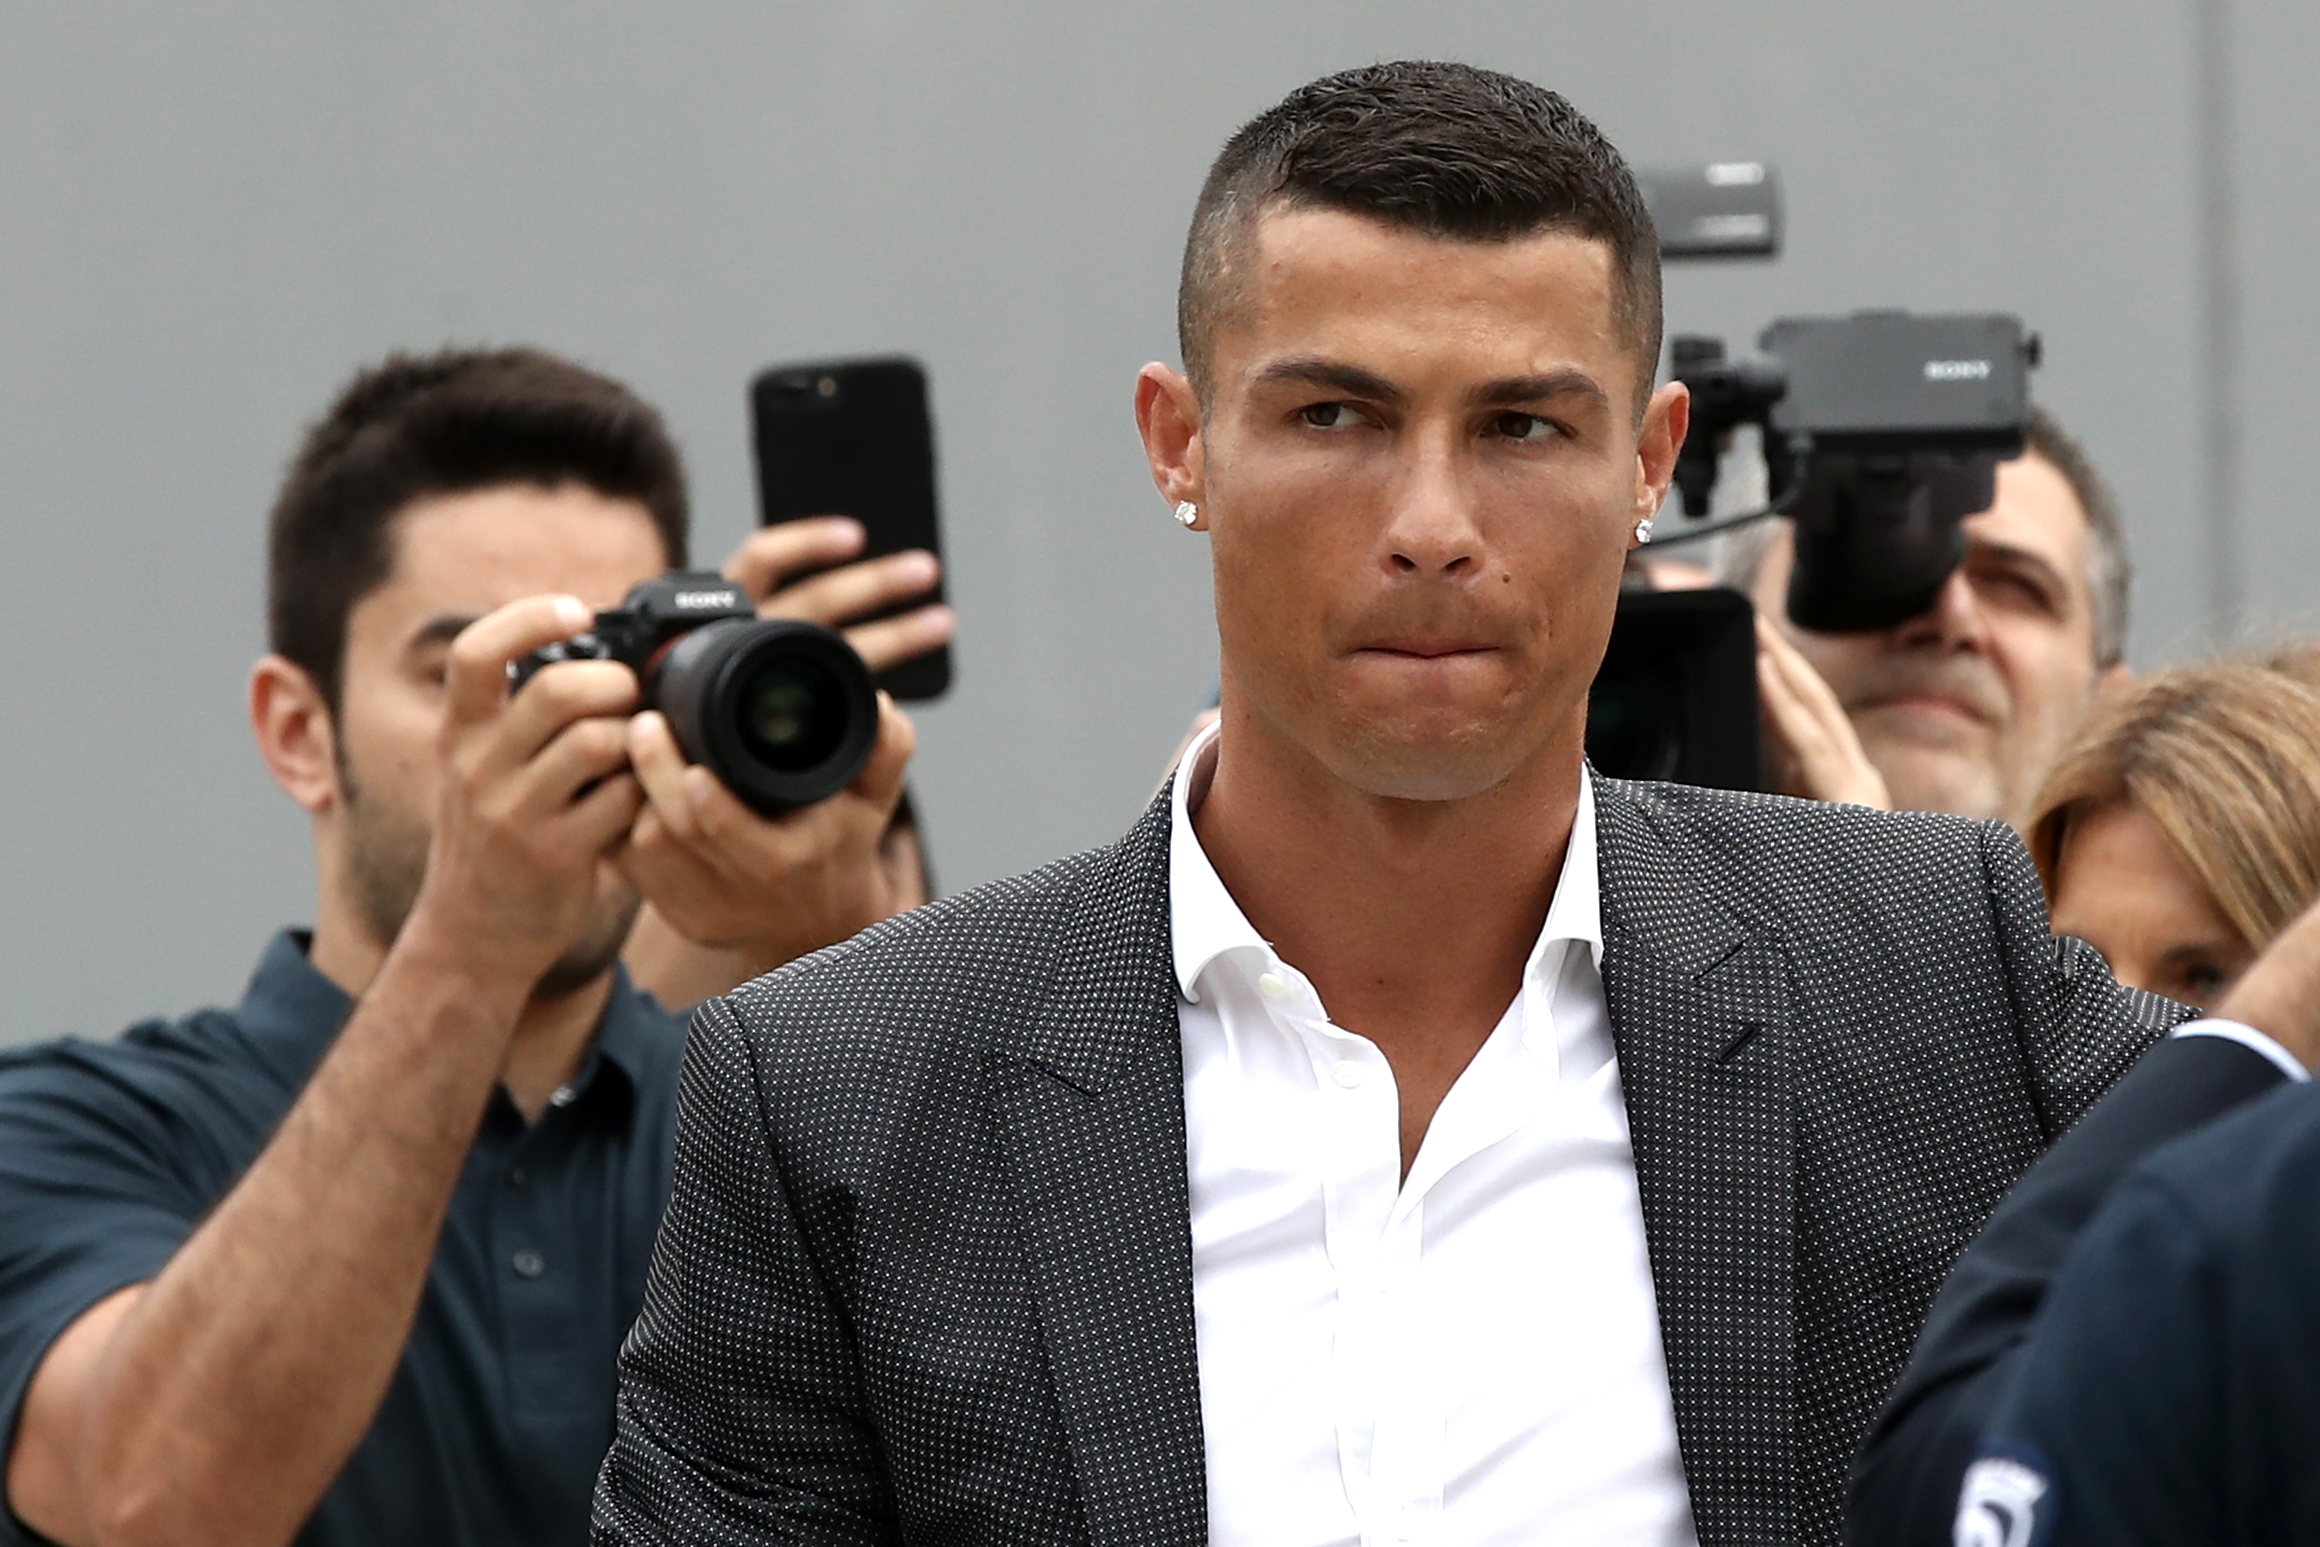 Nem emelnek vádat Cristiano Ronaldo ellen nemi erőszak miatt